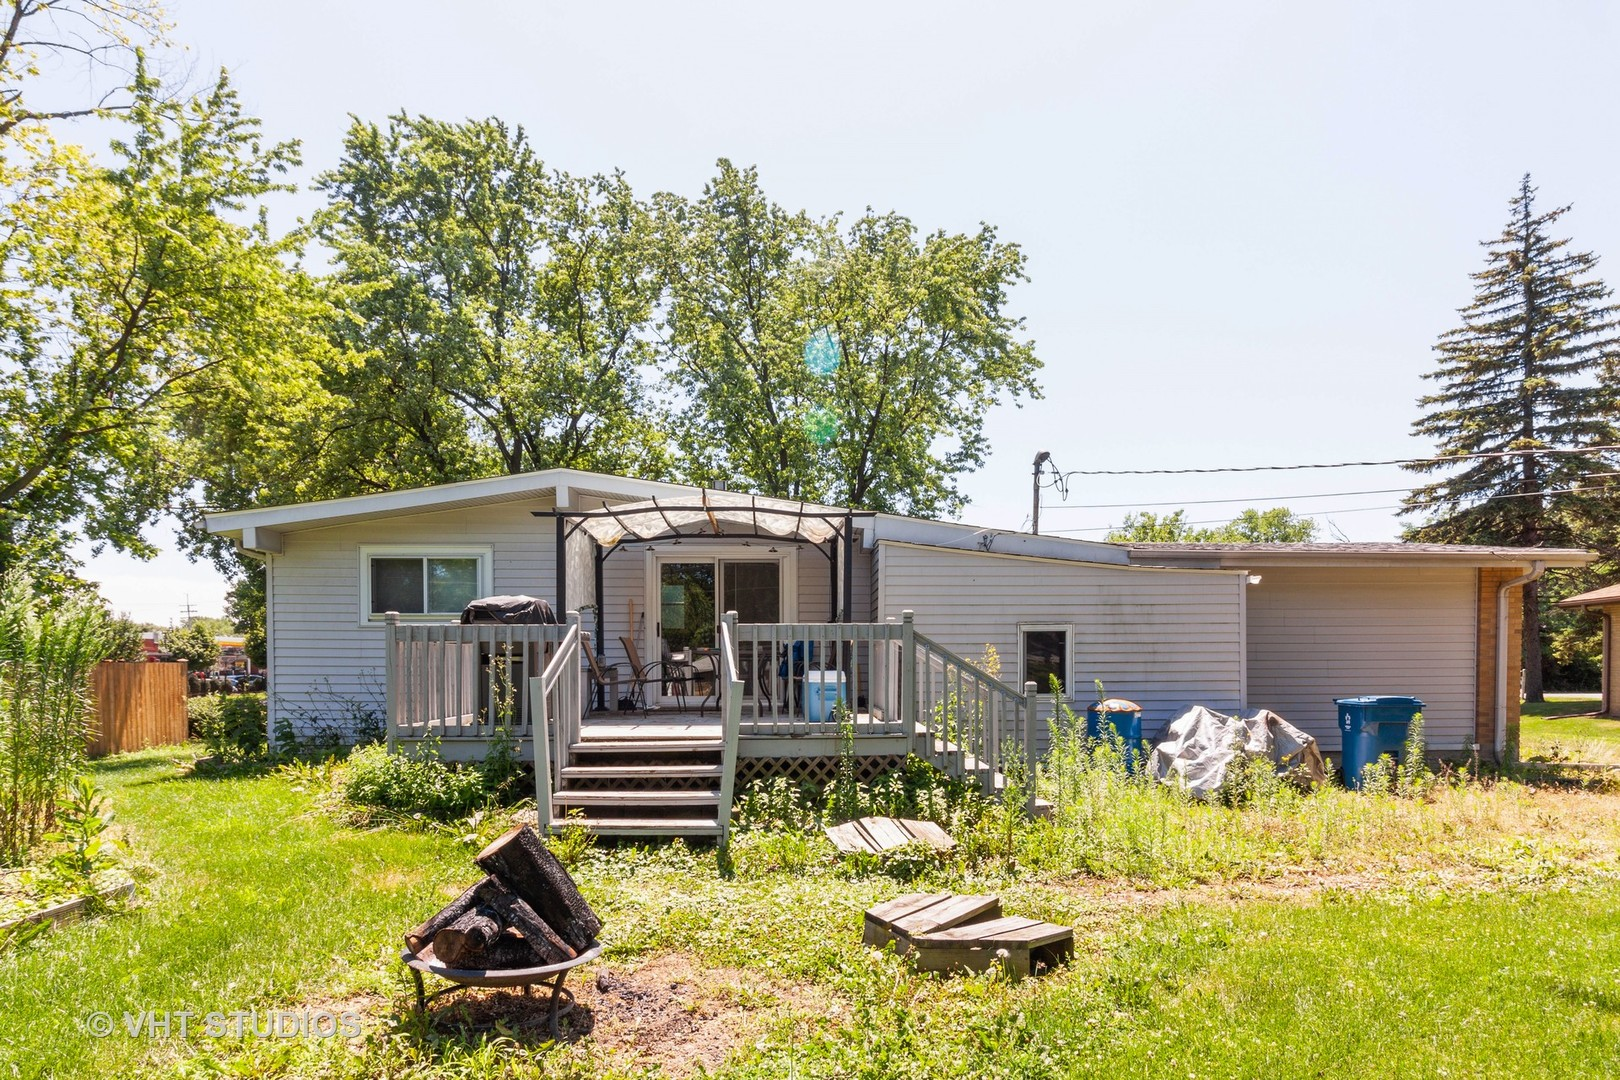 17W062 Hawthorne, Bensenville, Illinois, 60106